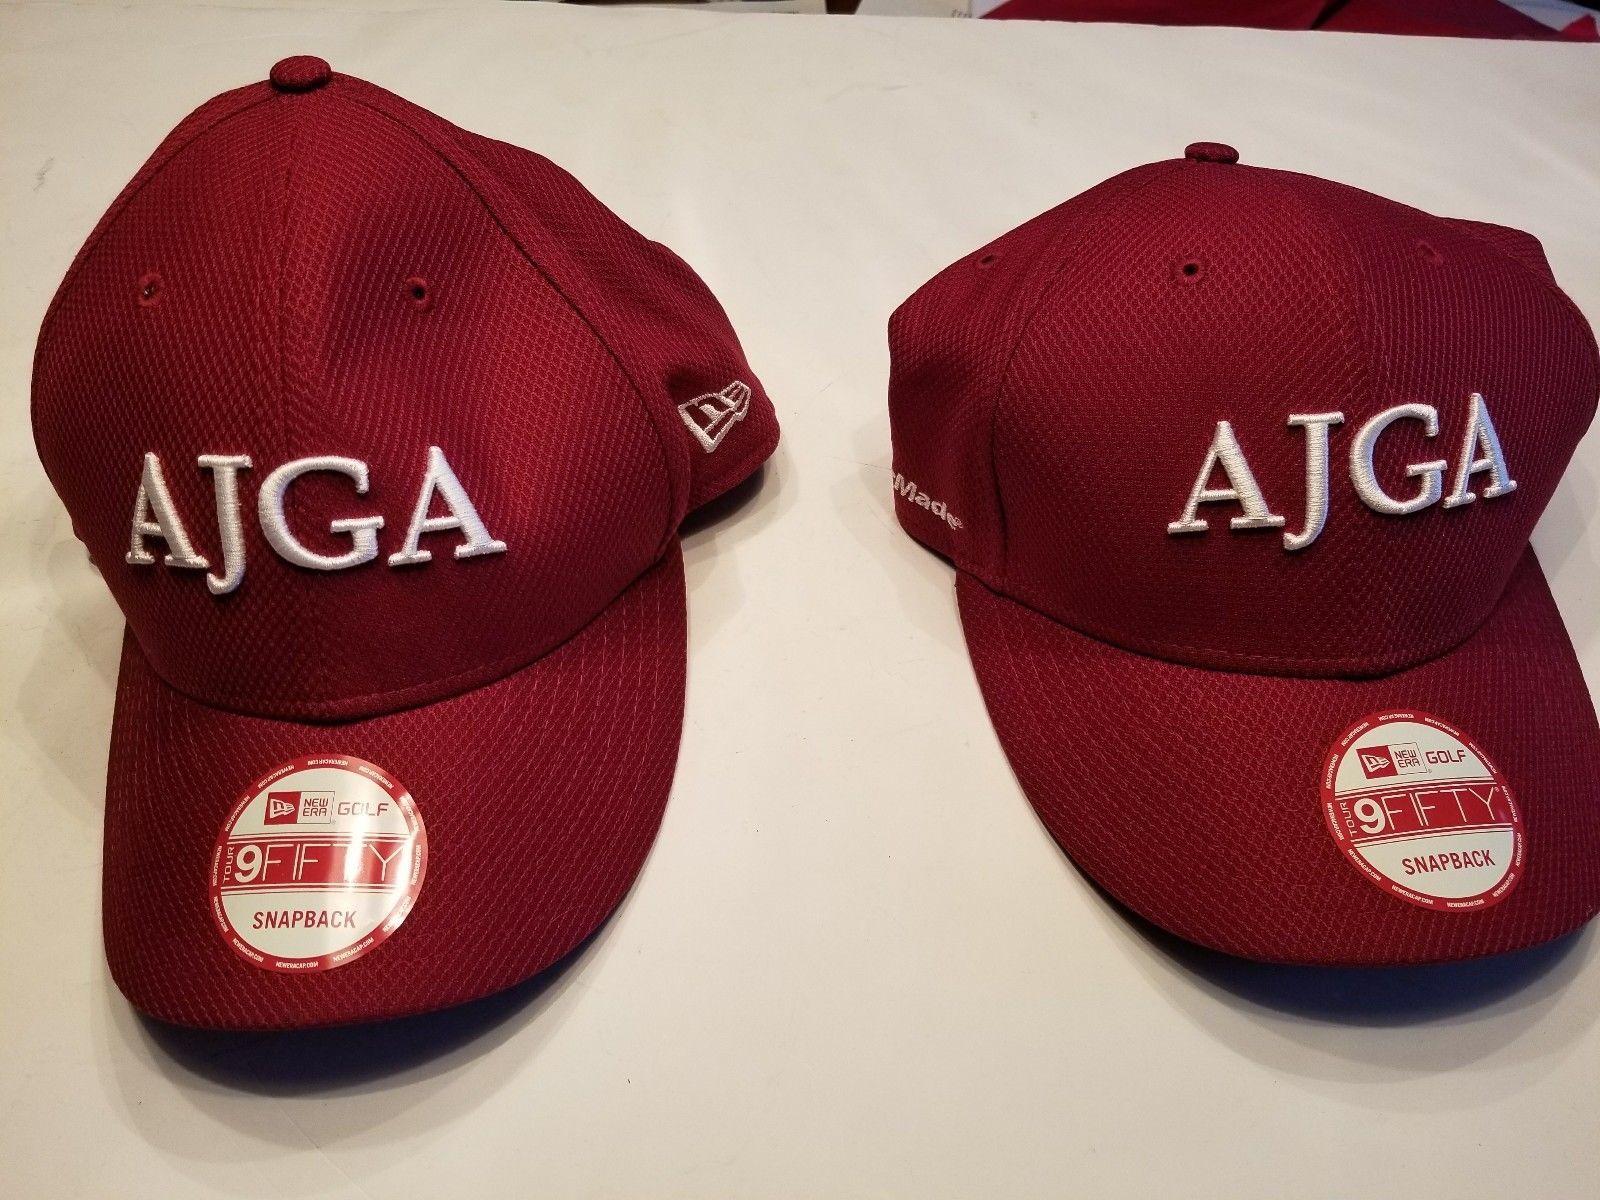 Lot 2 Ajga Golf Hat Cap Snapback Red Maroon and 28 similar items f77d4625972f